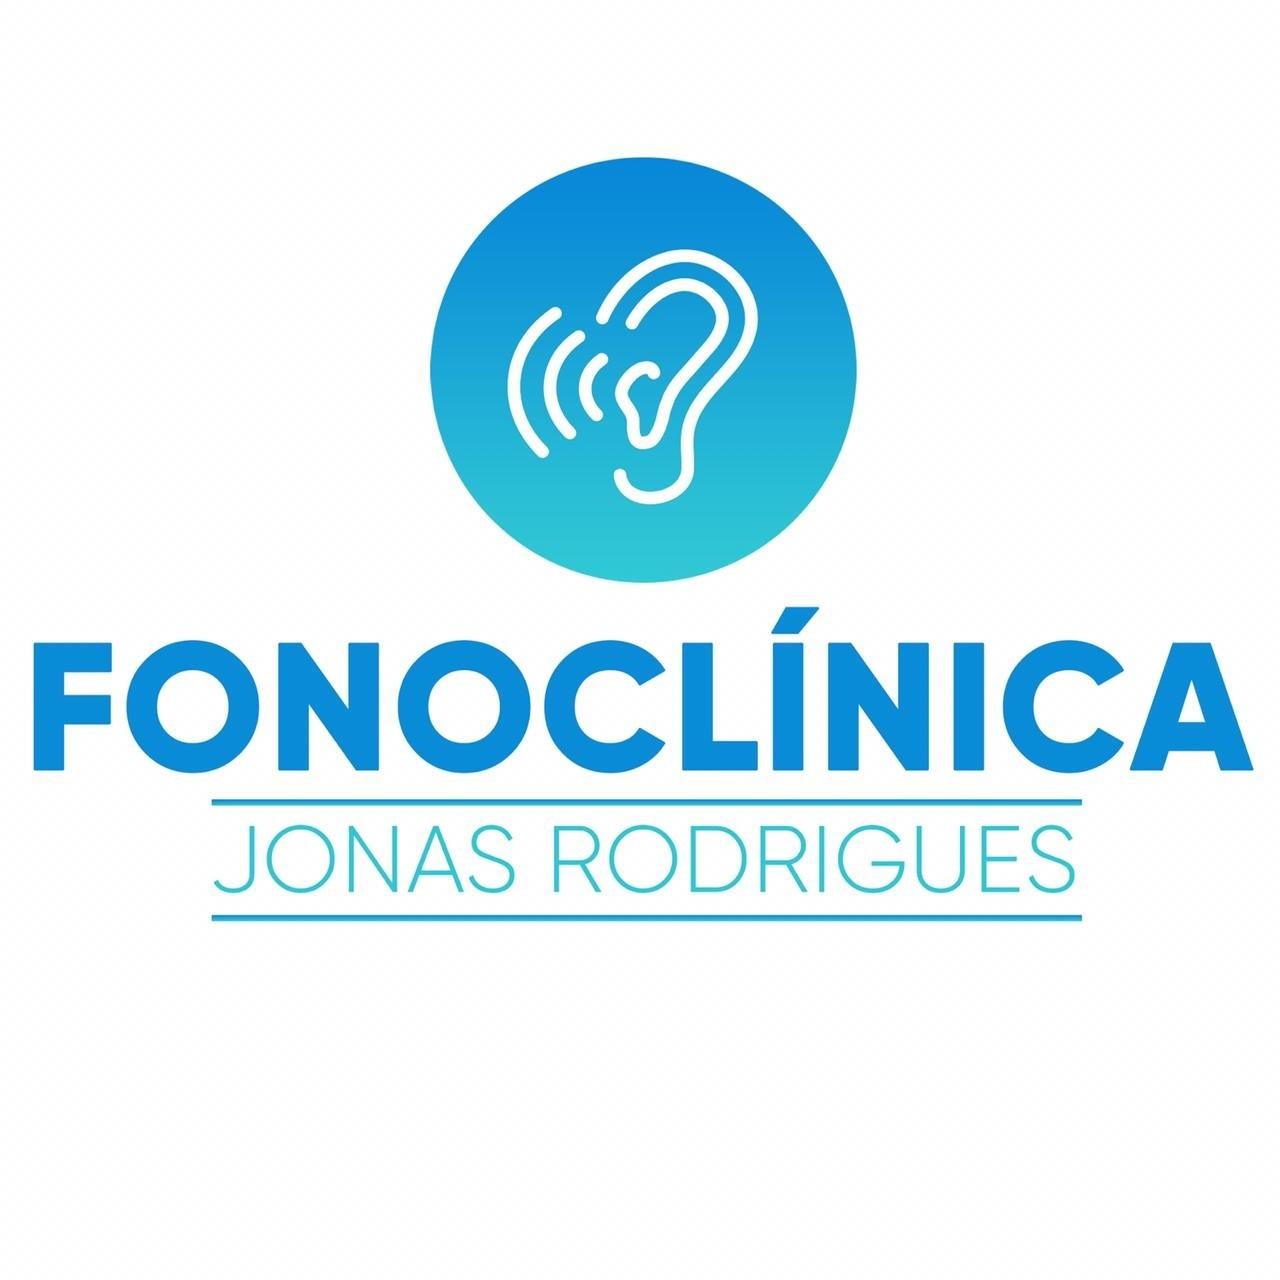 Fonoclínica Jonas Rodrigues